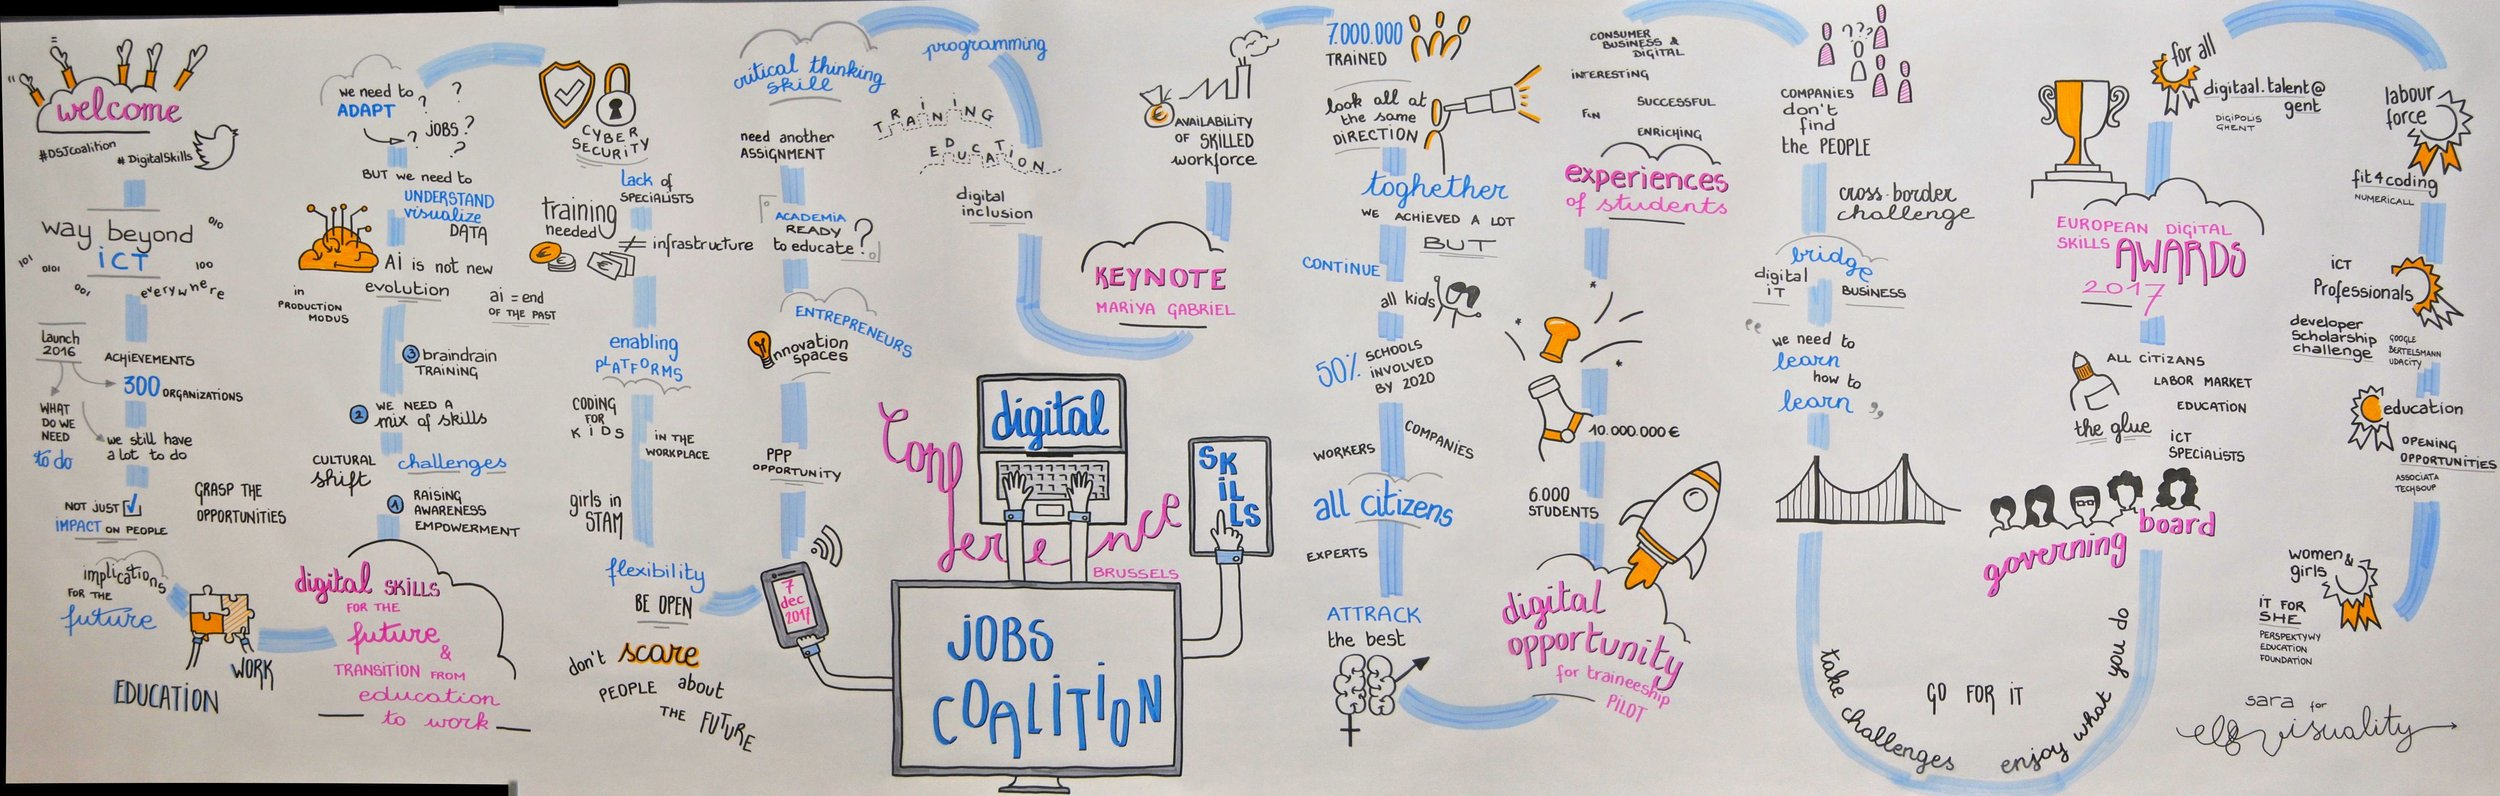 EC digital skills.jpg